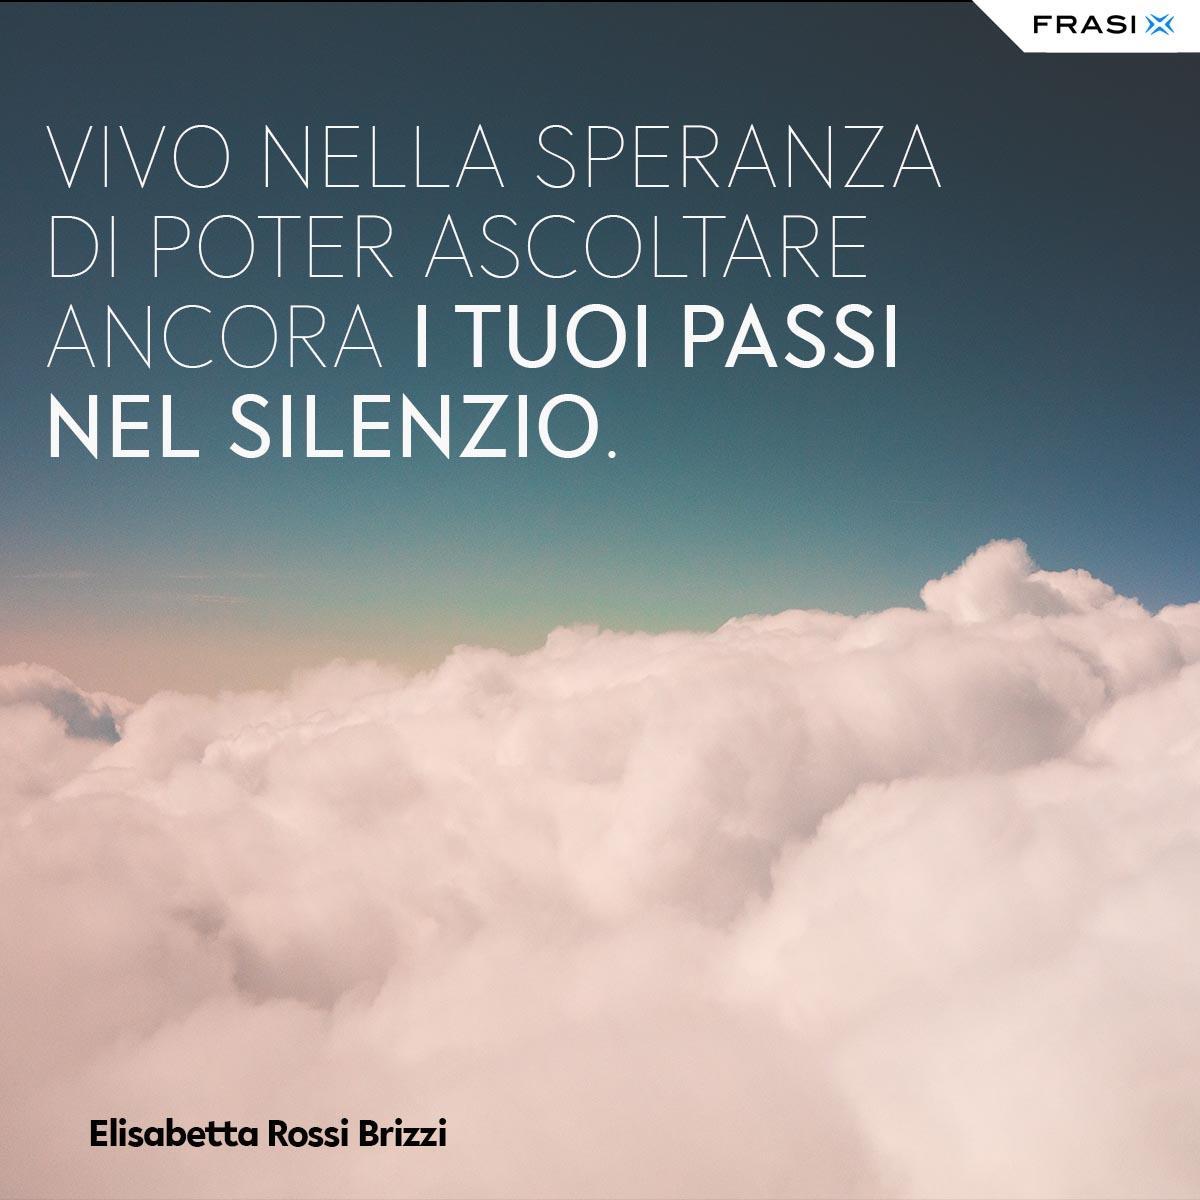 Frasi tumblr tristi Elisabetta Rossi Brizzi